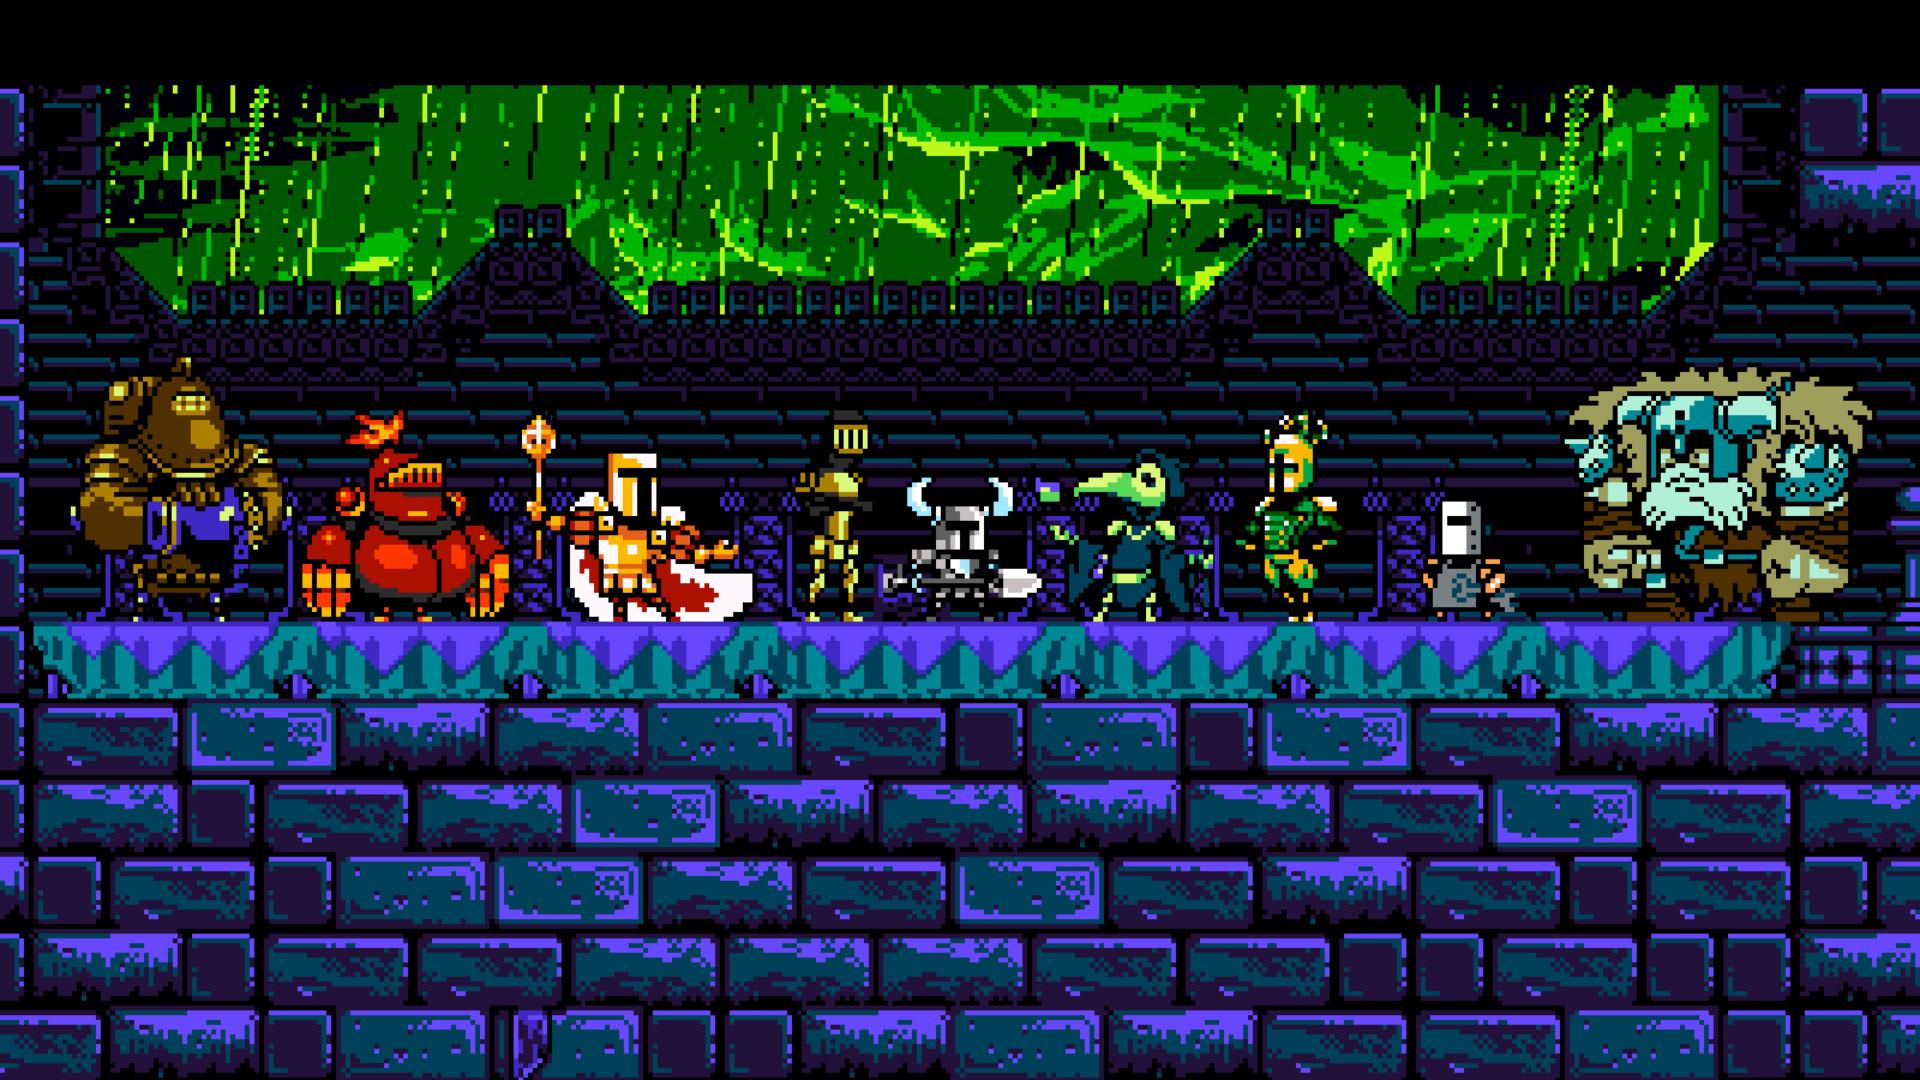 General Shovel Knight video games pixel art retro games 8-bit 16- bit